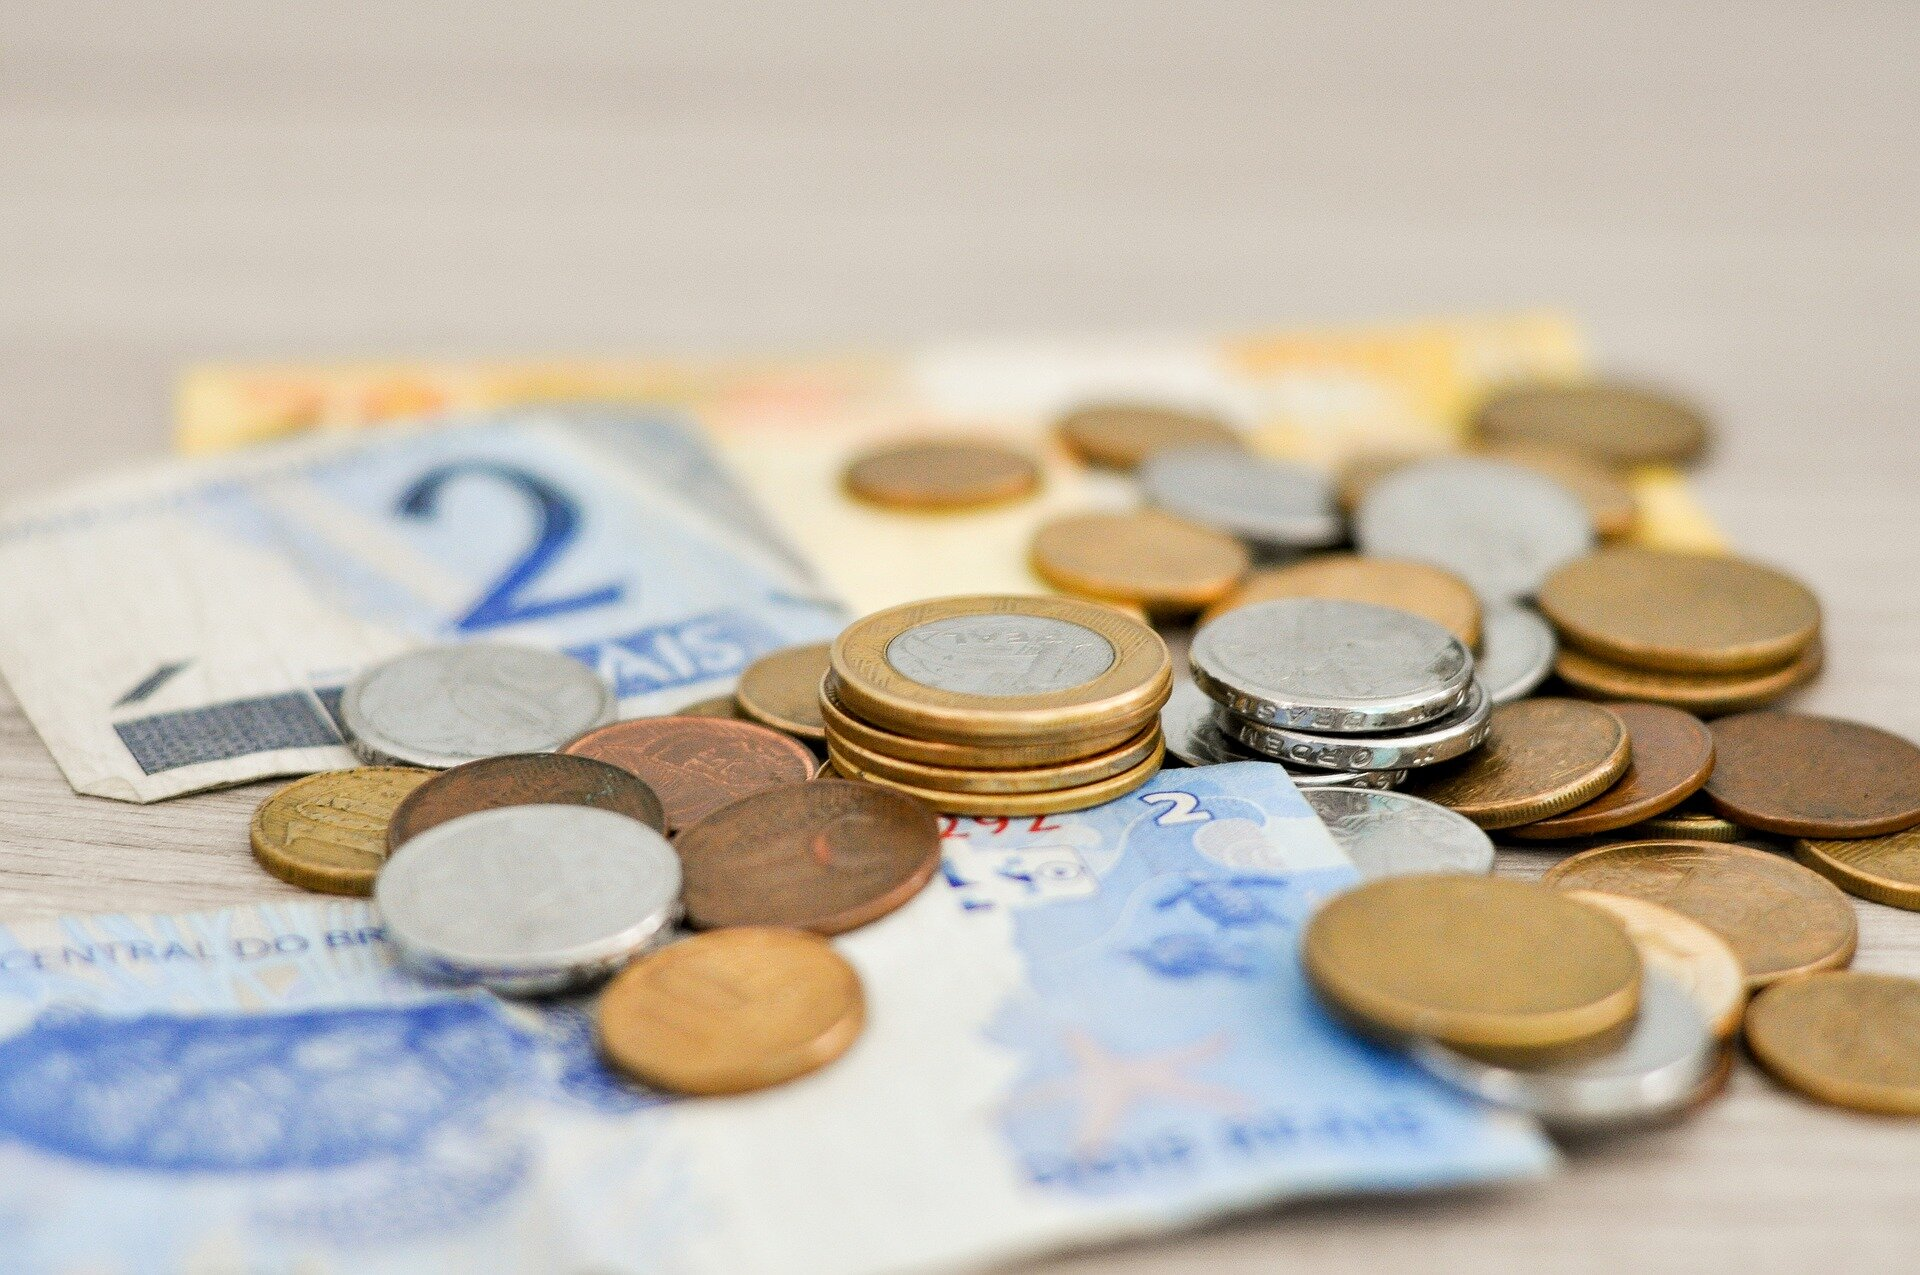 money-1632055_1920.jpg